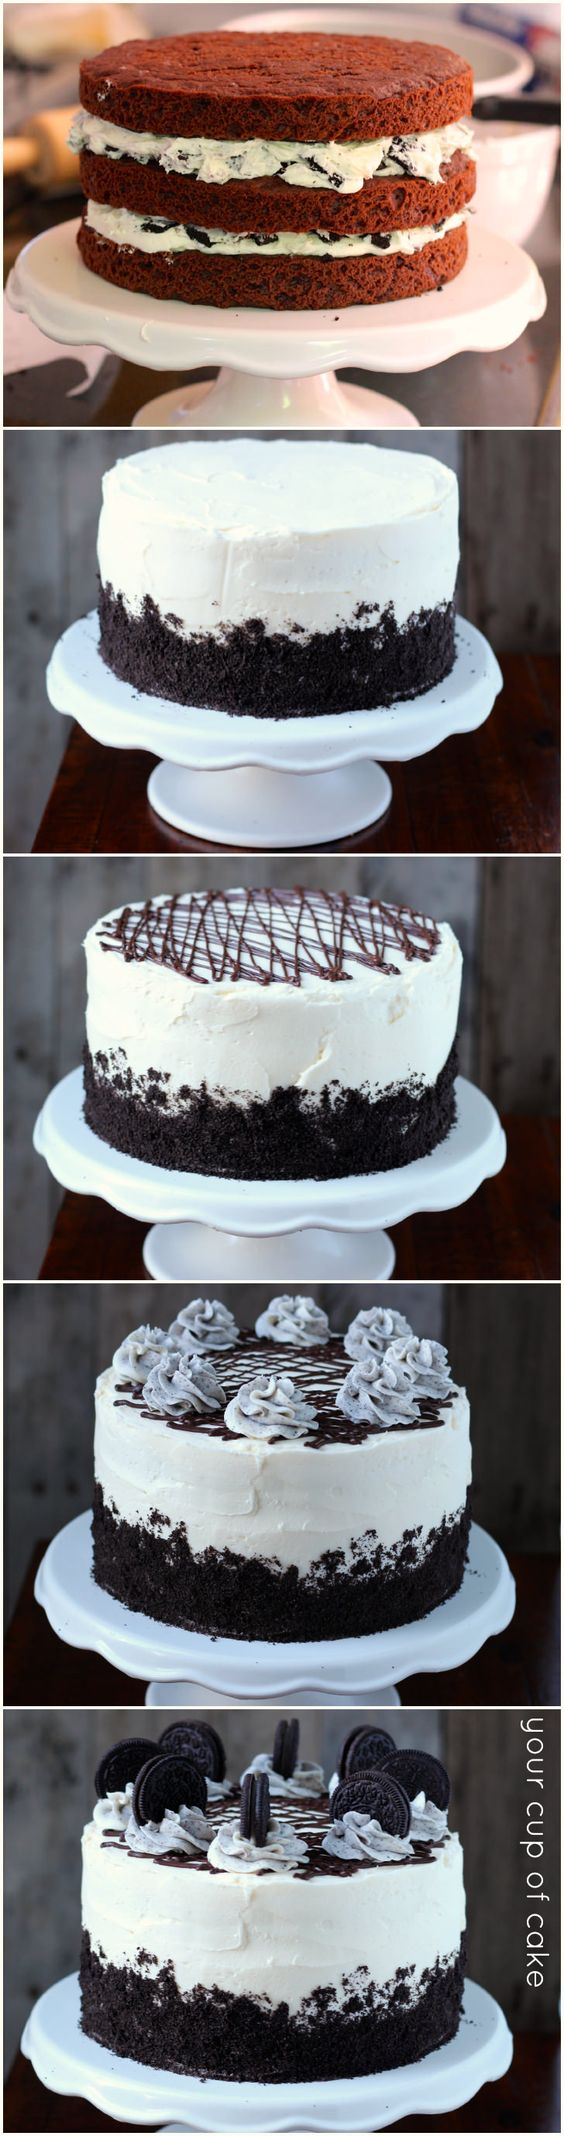 How to make an Oreo Cake. AMYYYYY!! @huebnamy @am: